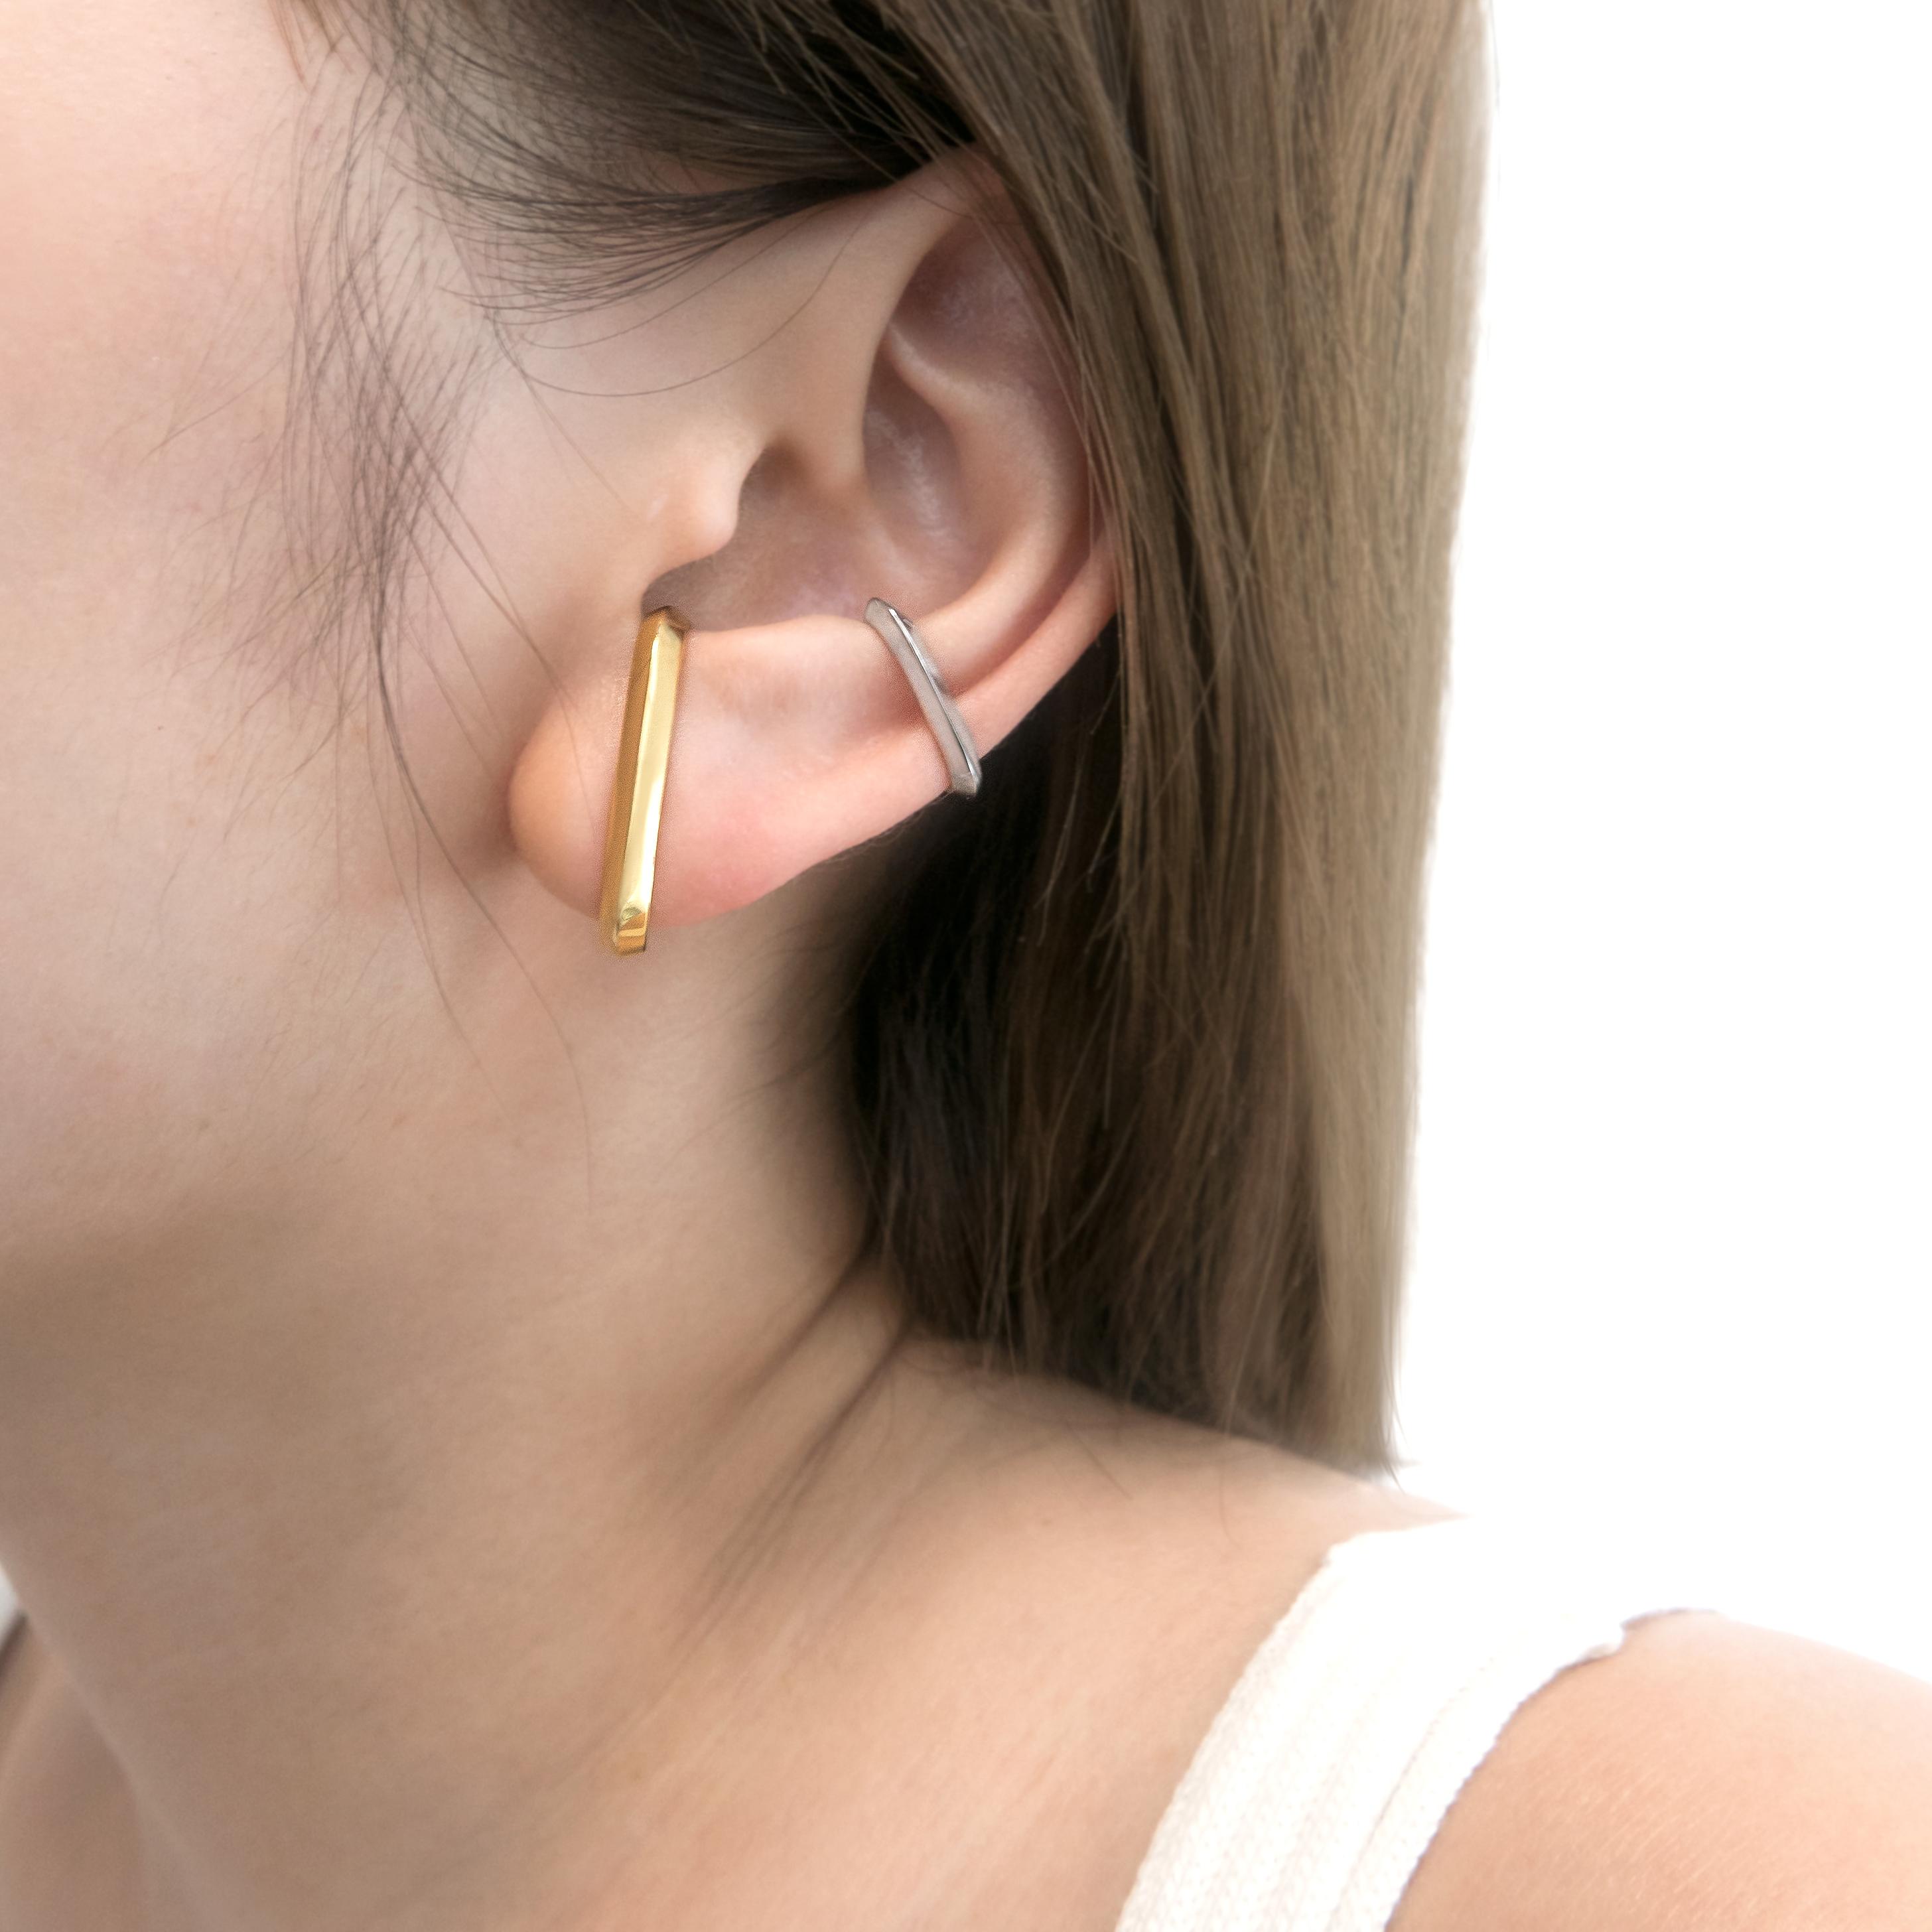 Large Crescent Earrings & Ear Cuff